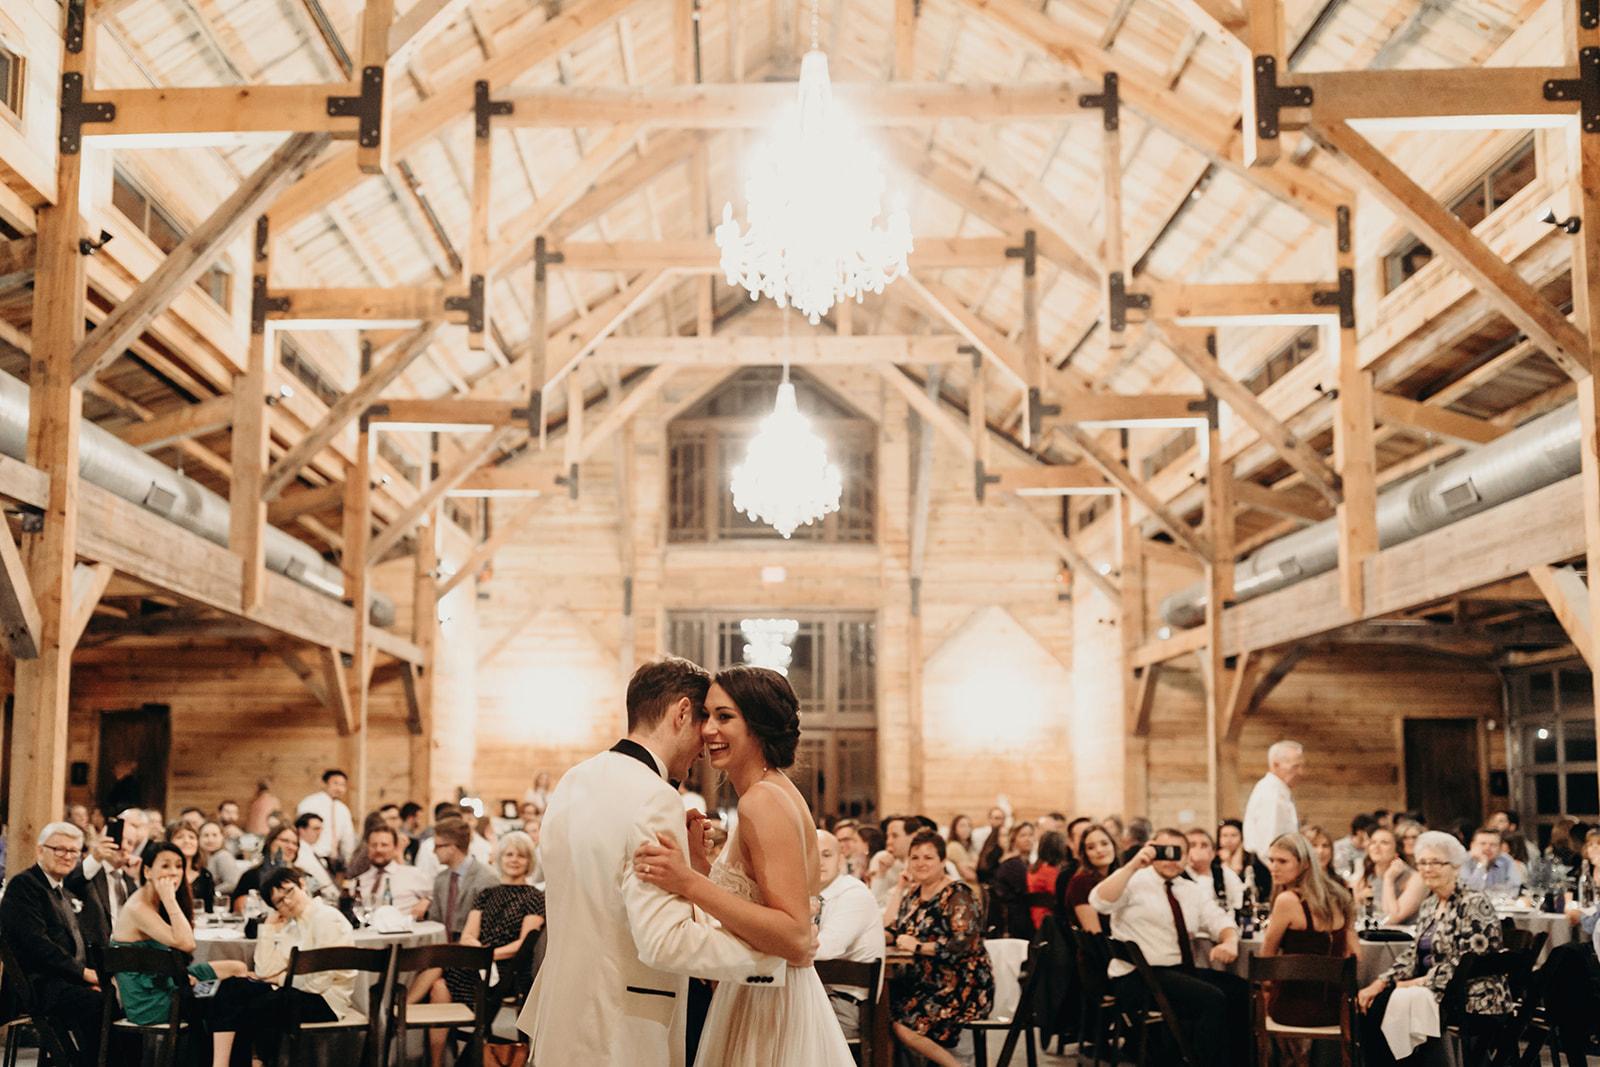 austin-wedding-lindsey-bryce-770.jpg